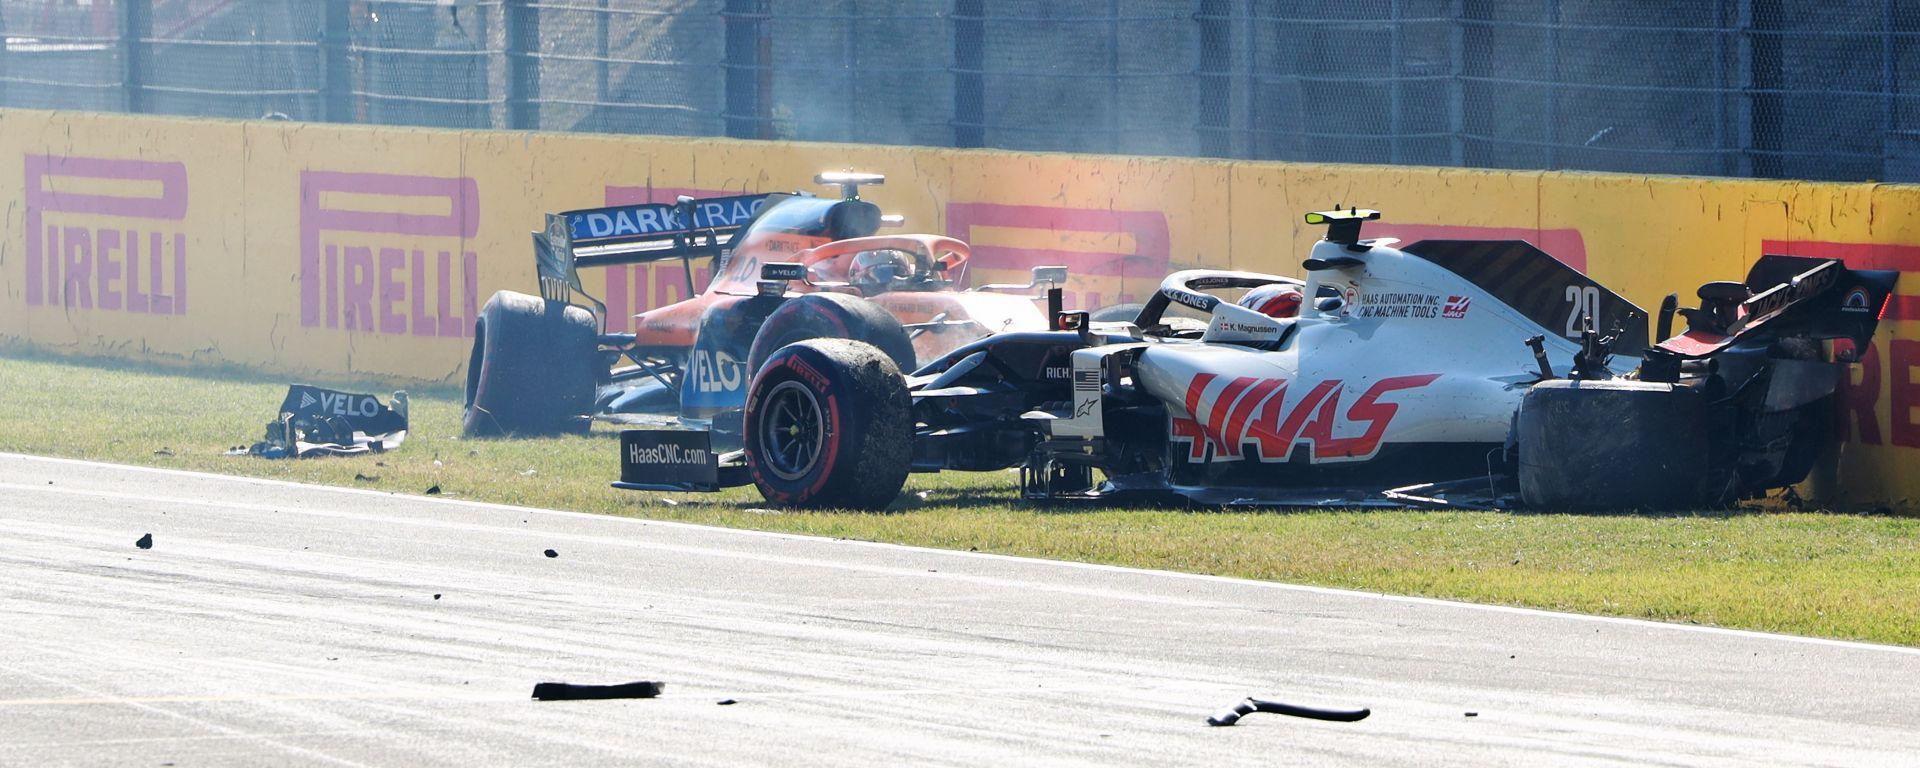 F1 GP Toscana 2020, Mugello: Magnussen (Haas) e Sainz (McLaren) dopo l'incidente alla ripartenza